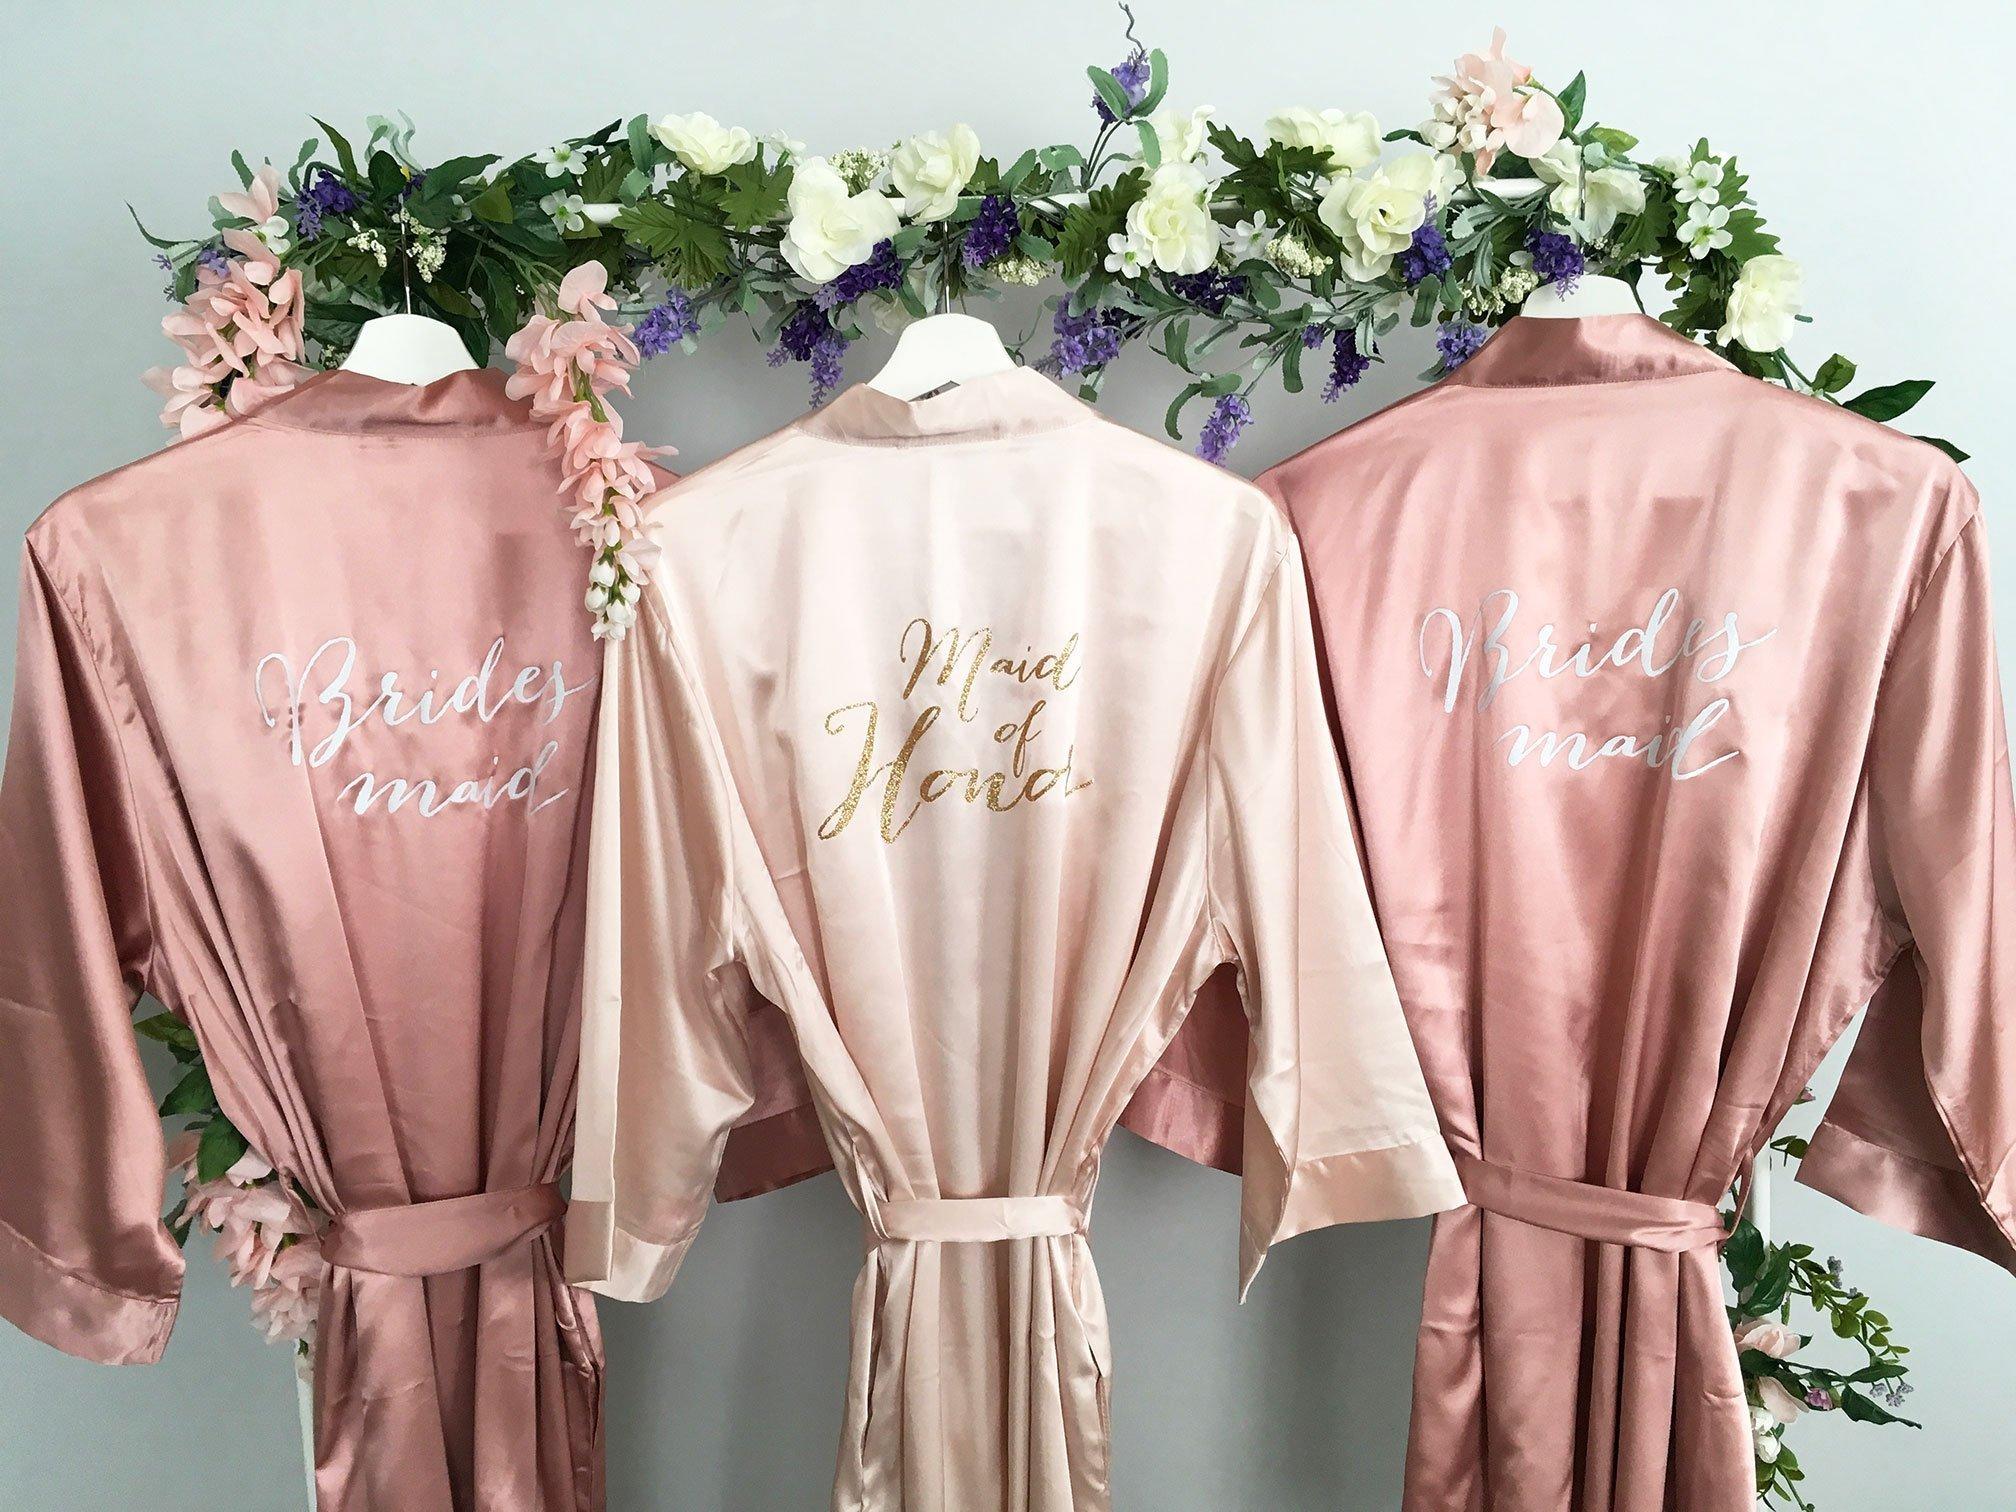 Bridesmaid Robe, Maid of Honor Robe, Set of 3 Satin Robes, Blush, Rose Gold, Mauve, Dusty Rose, Vintage Pink Wedding, Bridal Party Robes, MANY COLORS